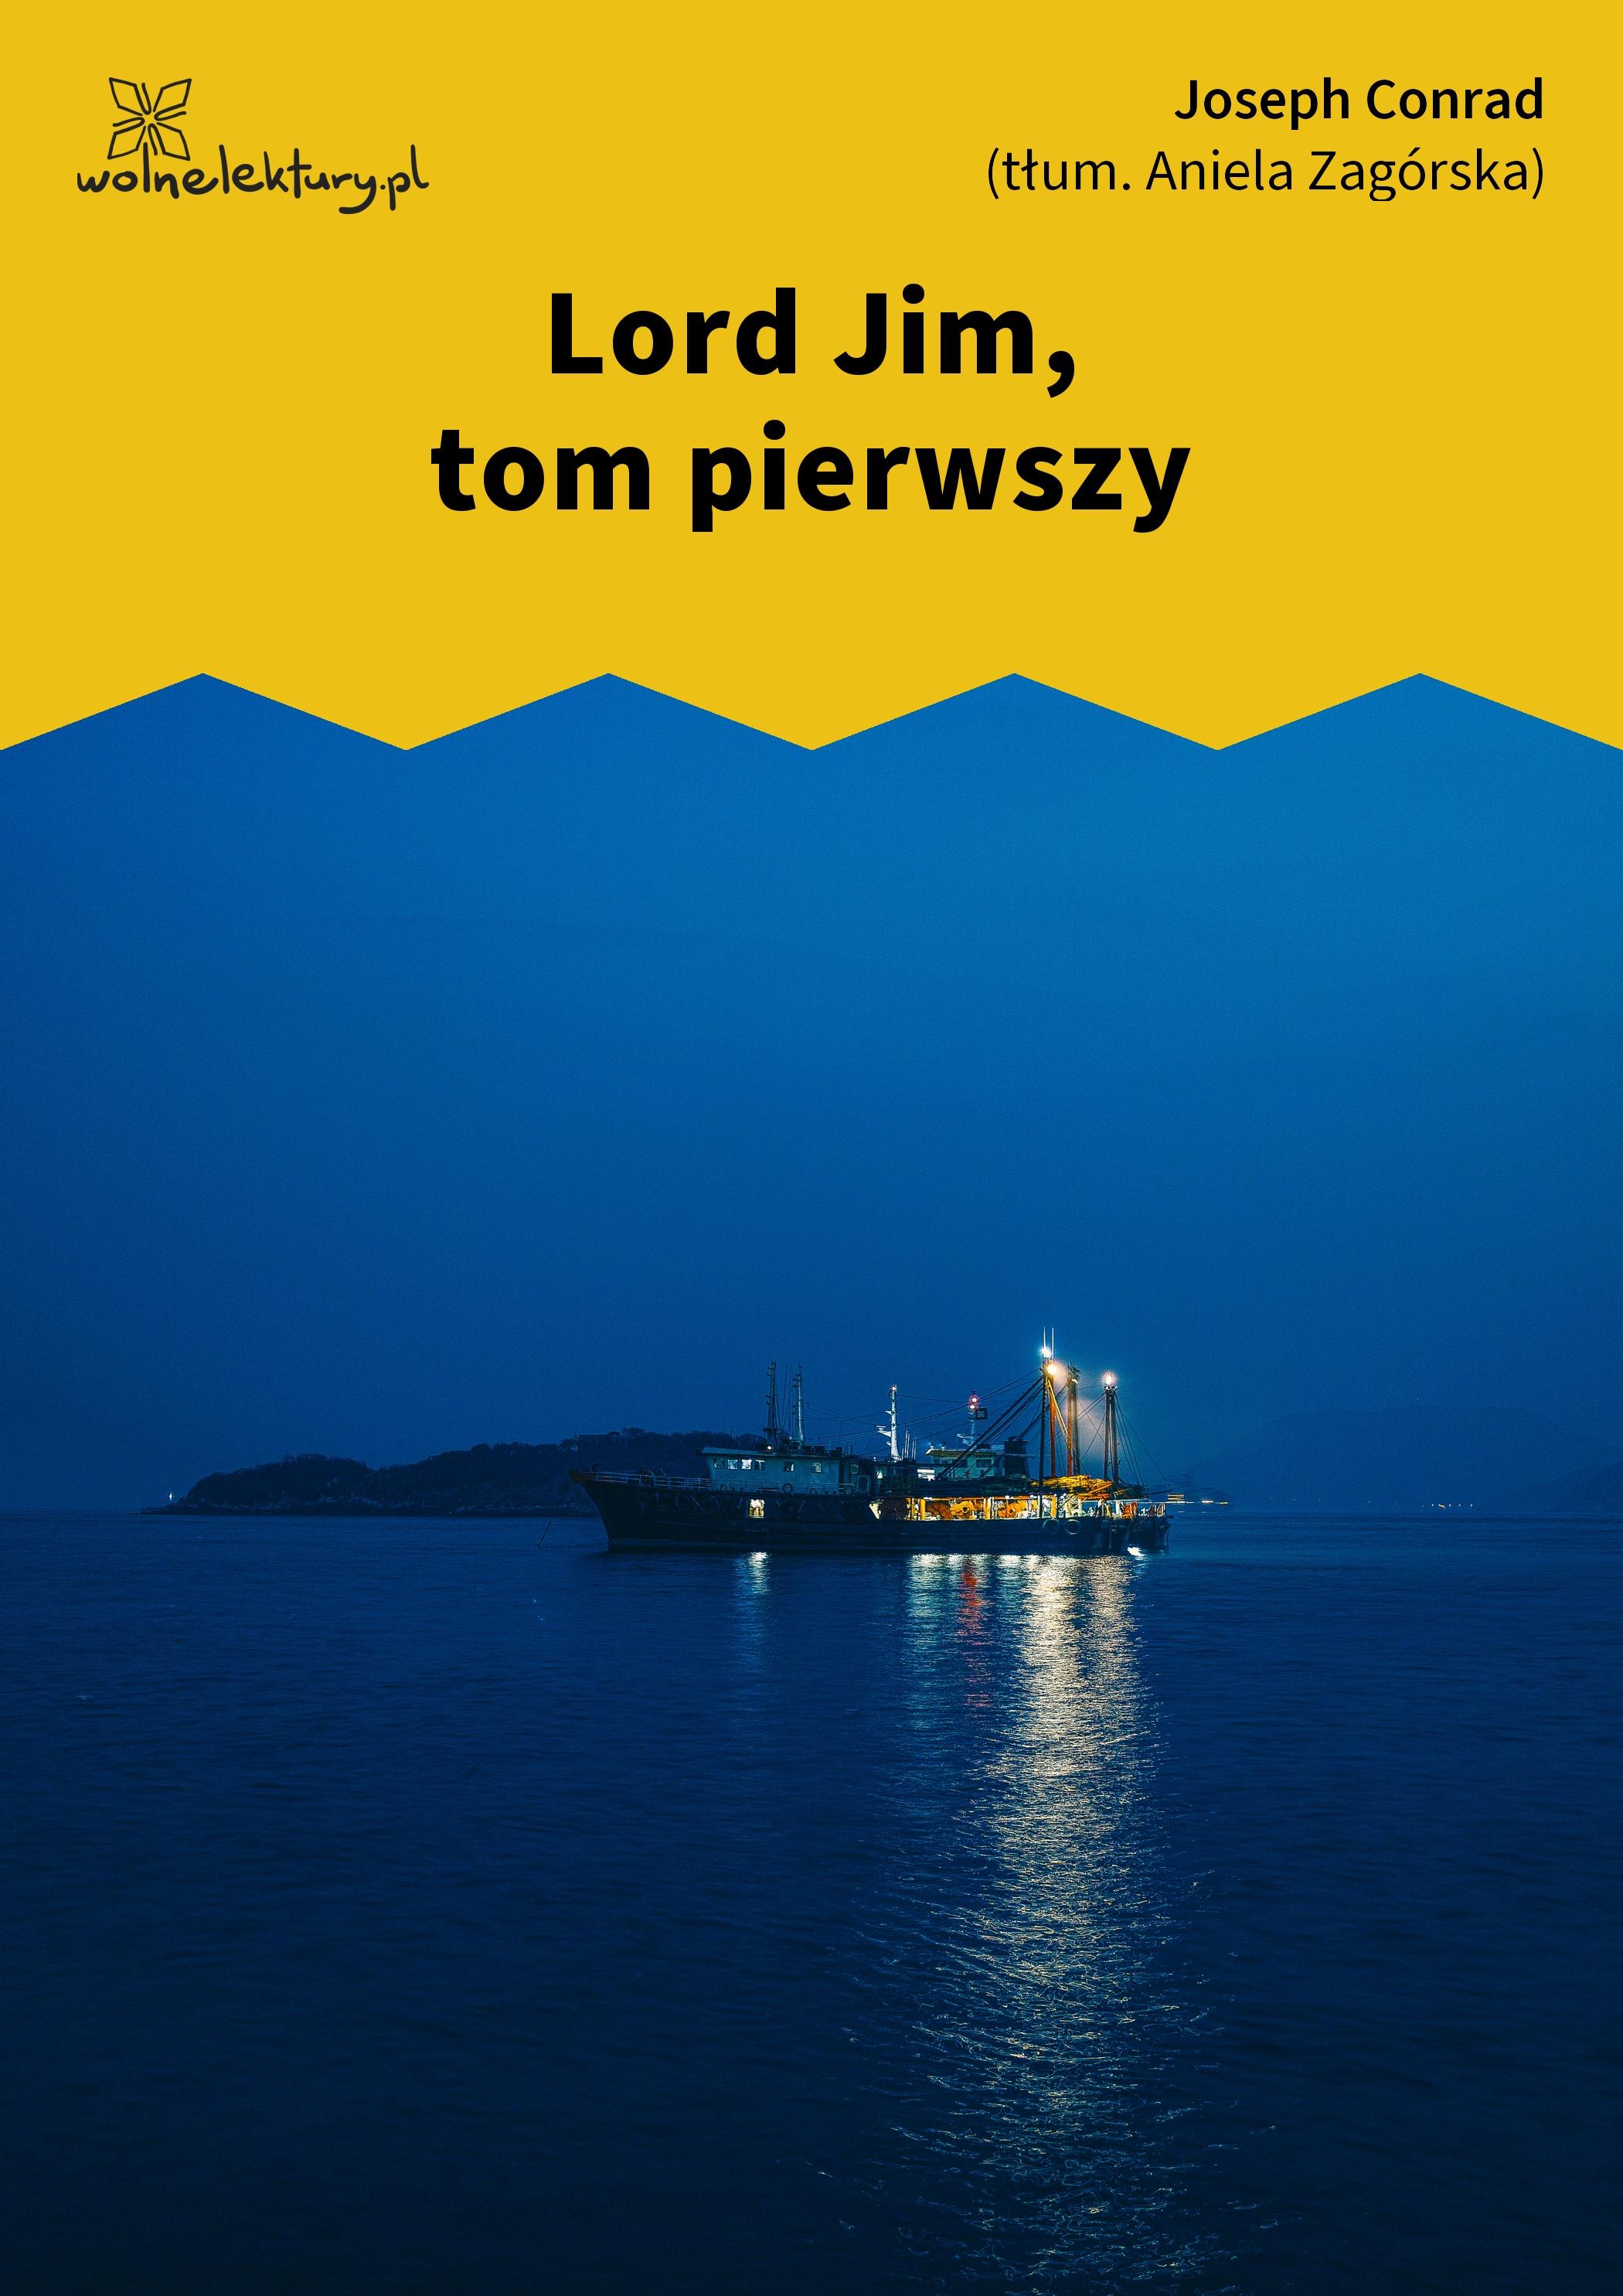 60186e51dbf45 Joseph Conrad, Lord Jim, Lord Jim, tom pierwszy :: Wolne Lektury